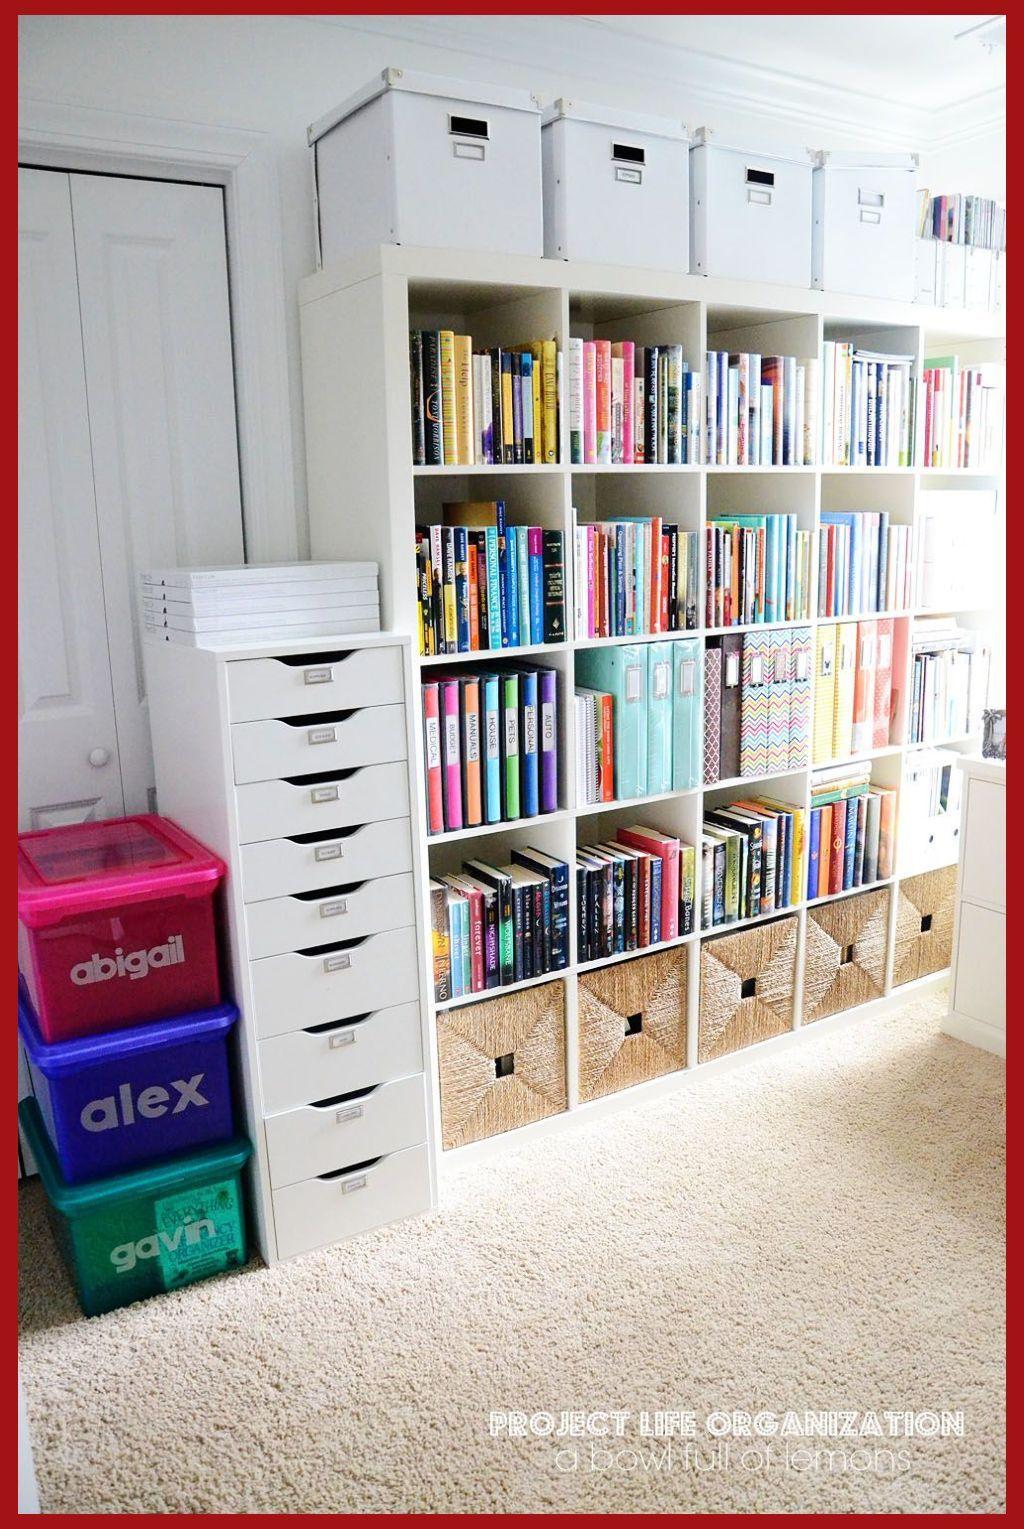 How To Save Money In Buying Office Supplies In 2020 Craft Room Storage Bookshelf Organization Home Organization